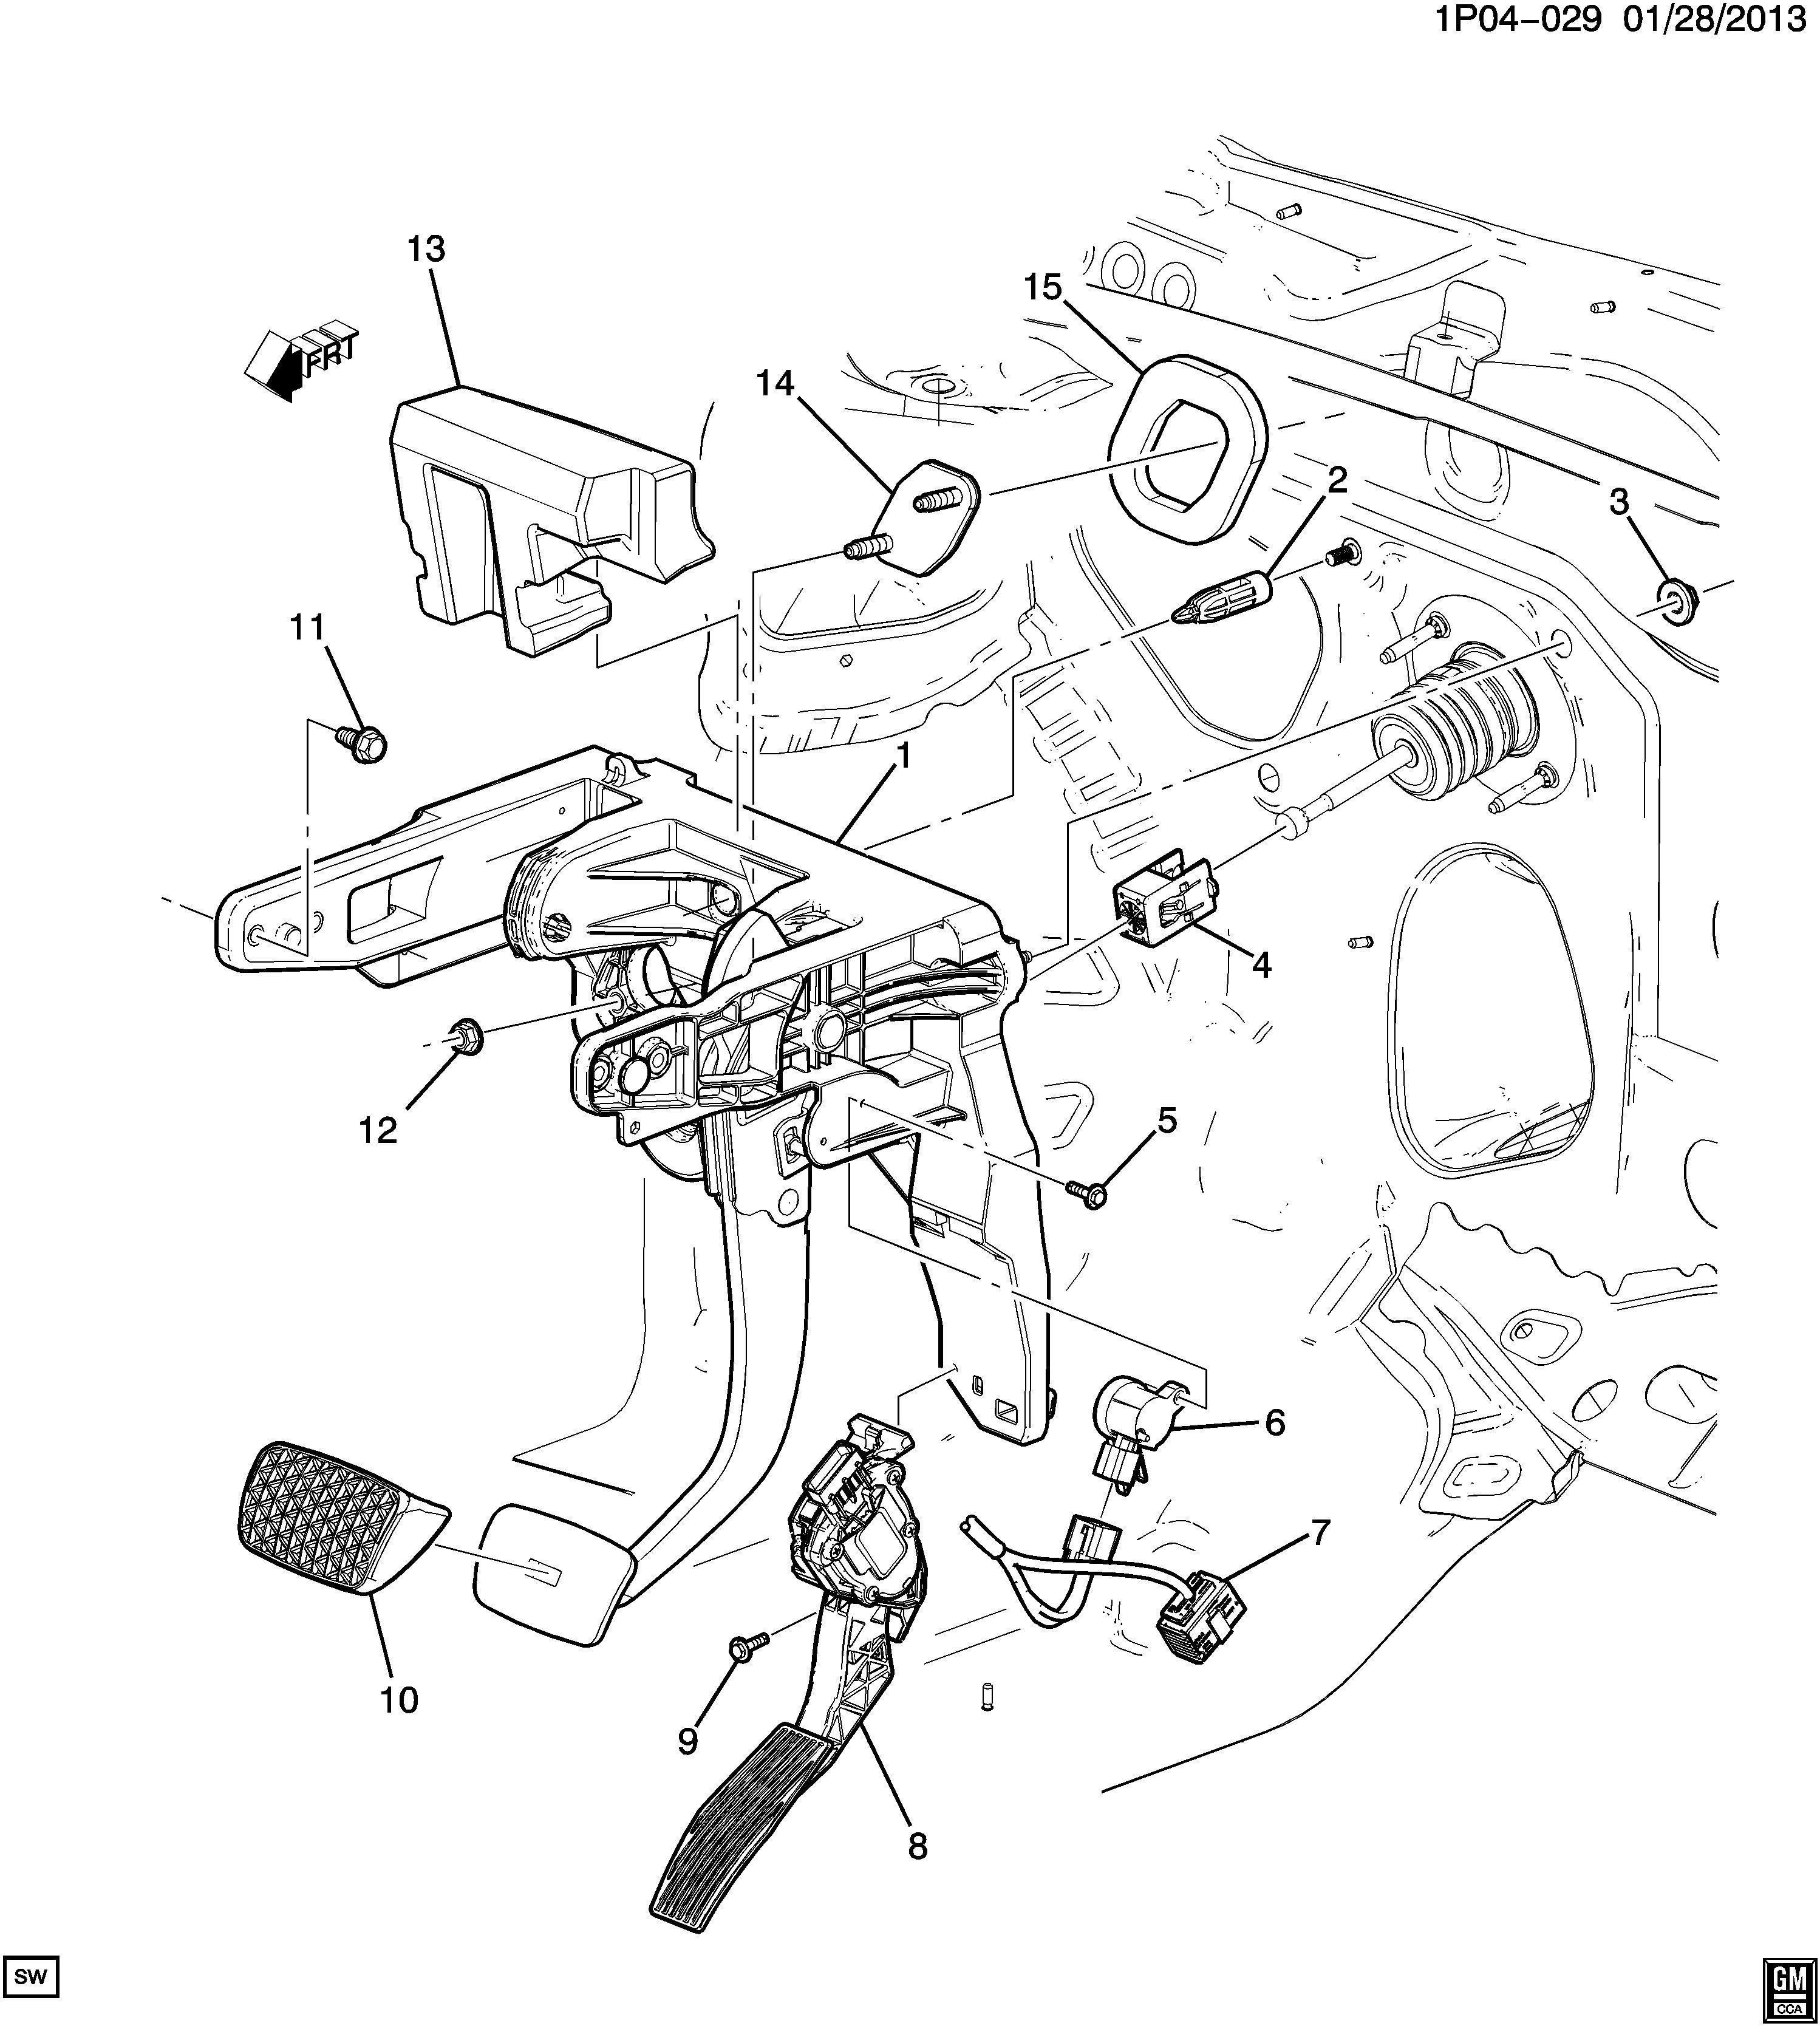 Chevrolet Cruze Pad. Brake/clutch pedal. Retainer. Brake